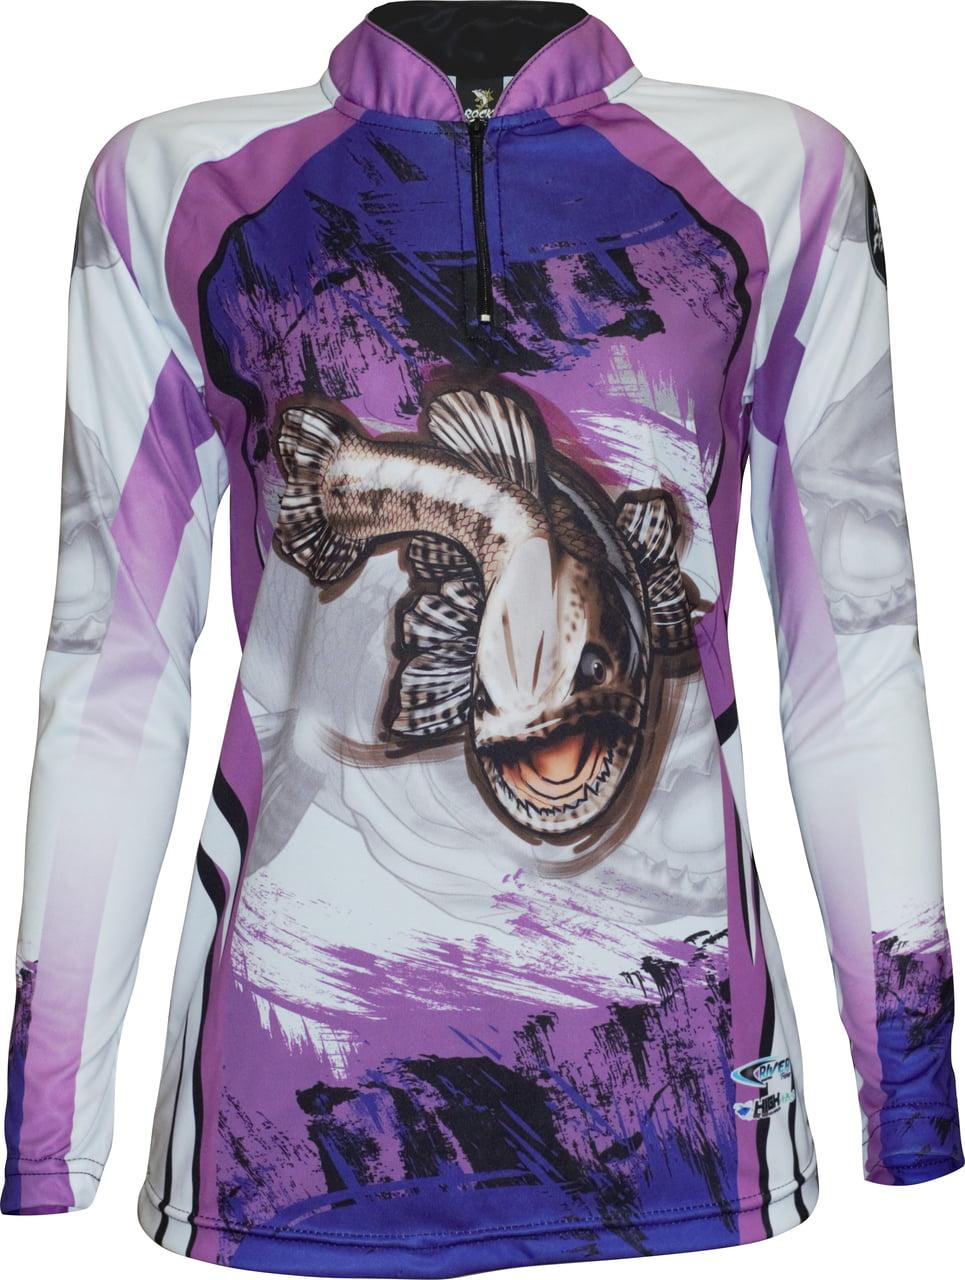 Camiseta feminina de pesca Traíra UV35+